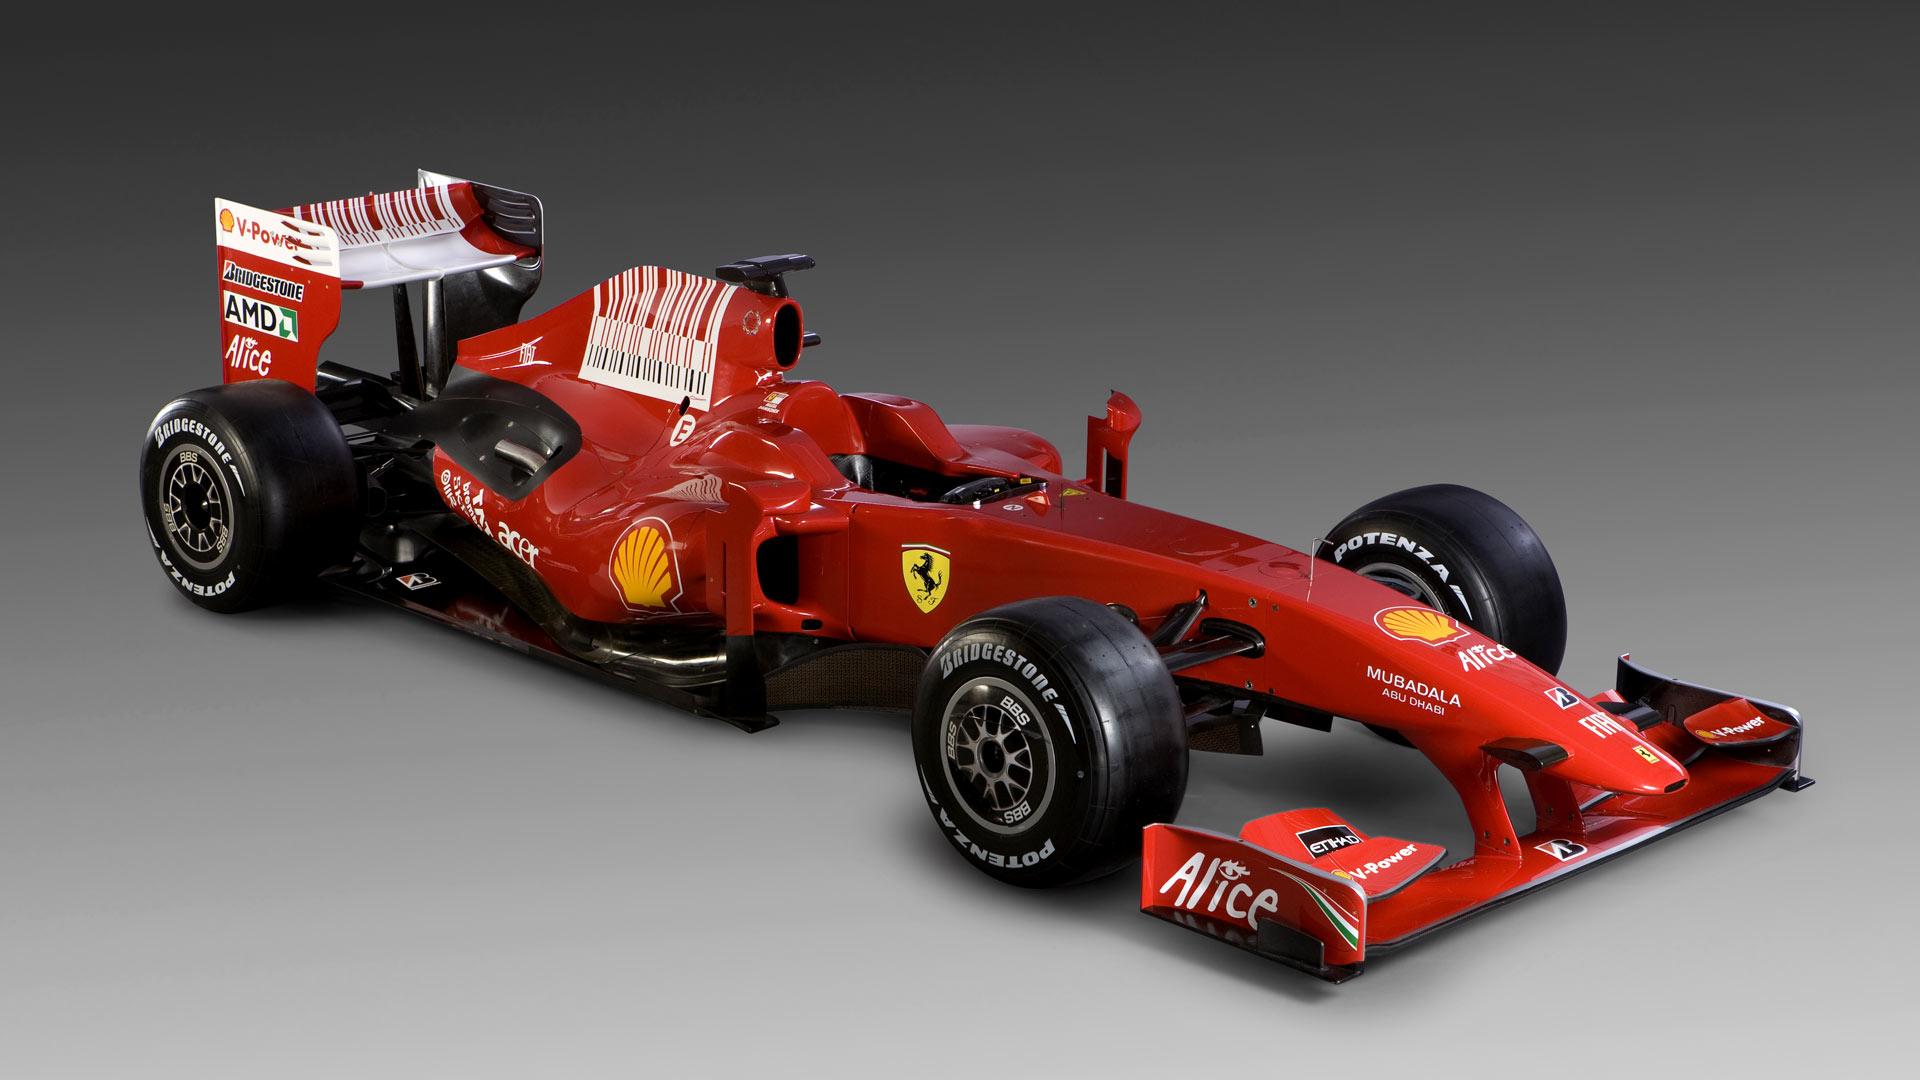 Ferrari F1 F60 World Cars High Resolution Wallpaper Free